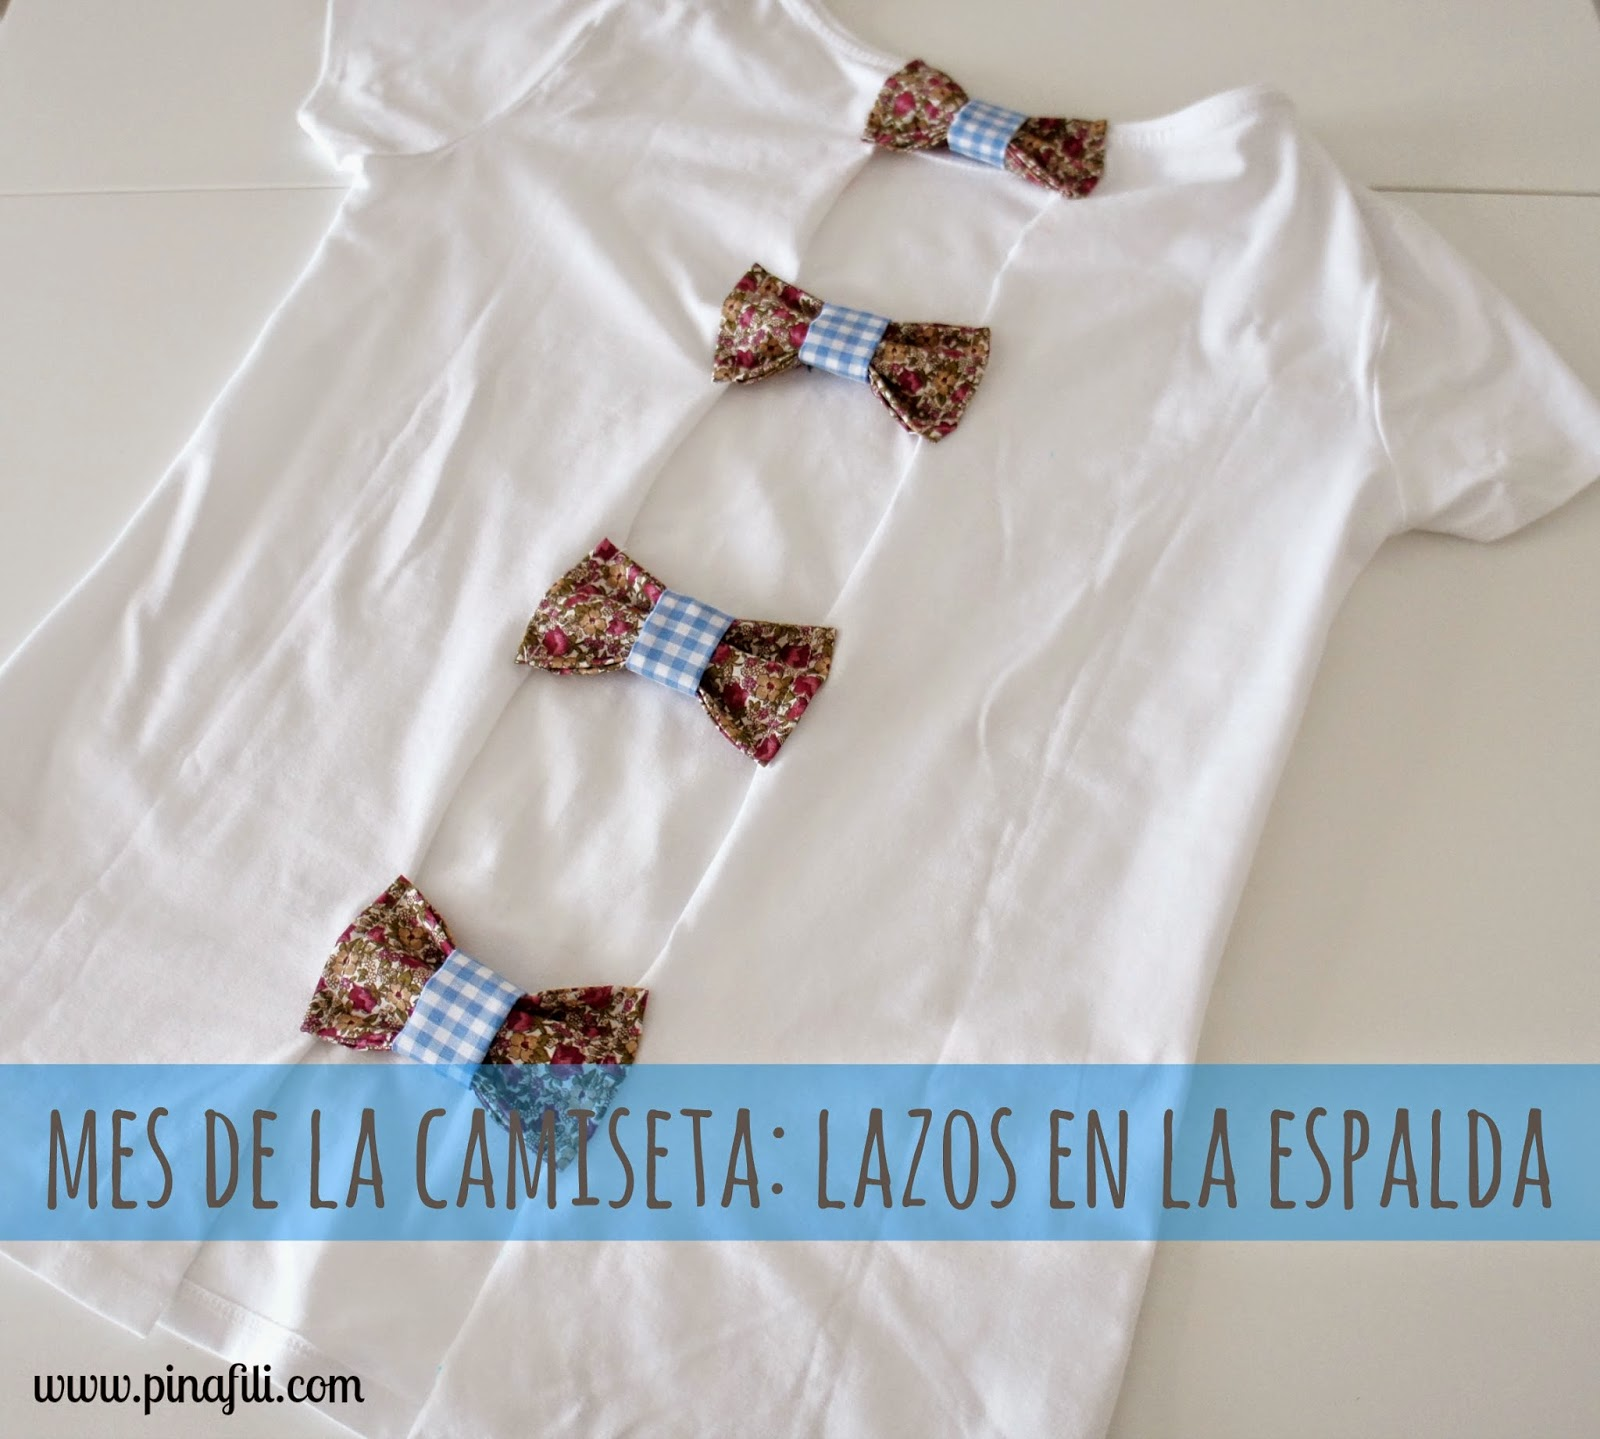 Pinafili resumen del mes de la camiseta - Decorar camisetas basicas ...